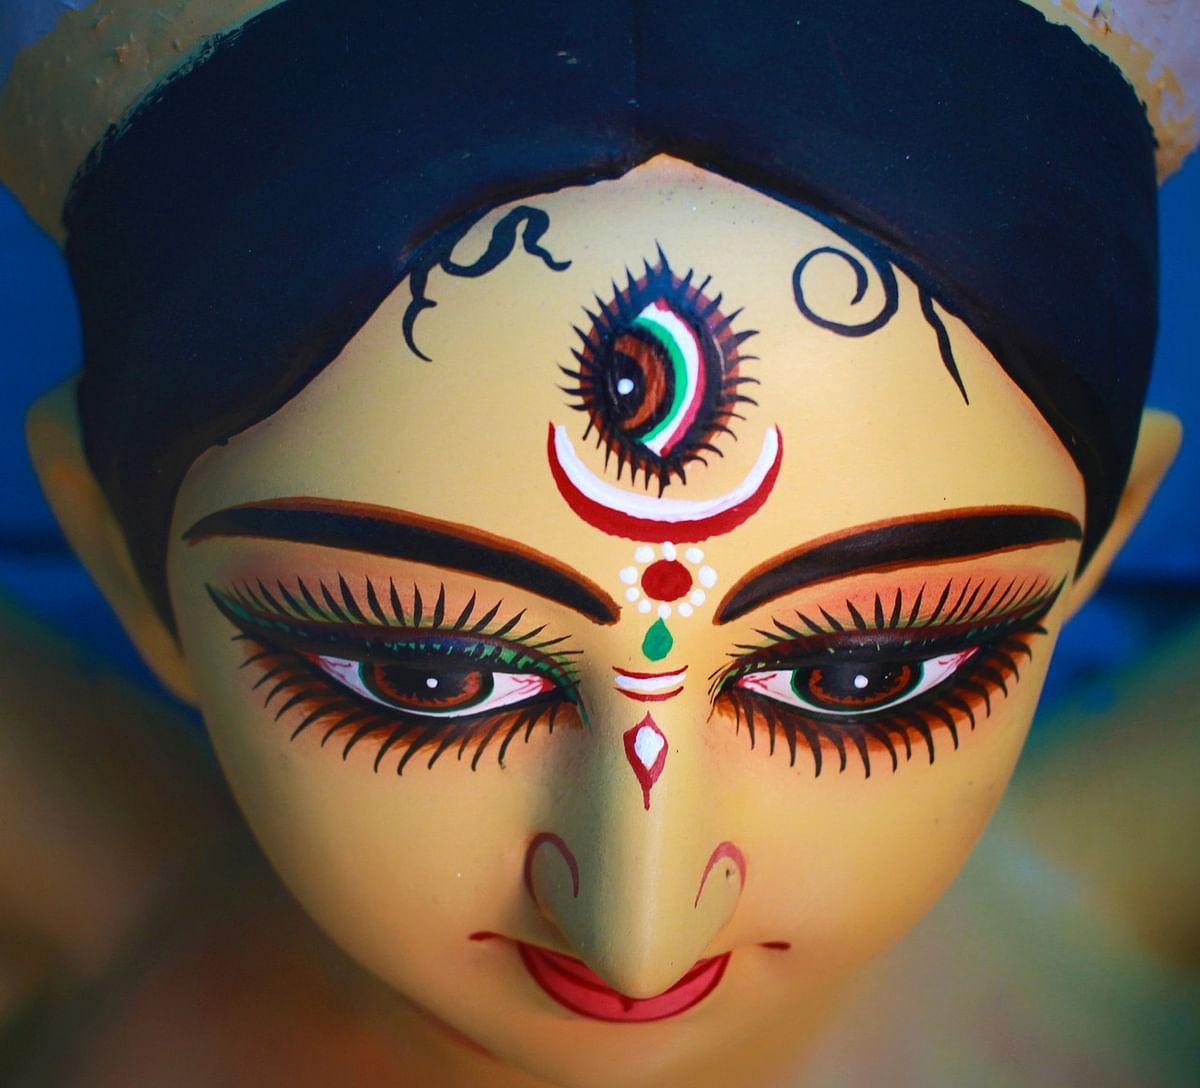 गुप्त नवरात्रि - Gupt Navratri